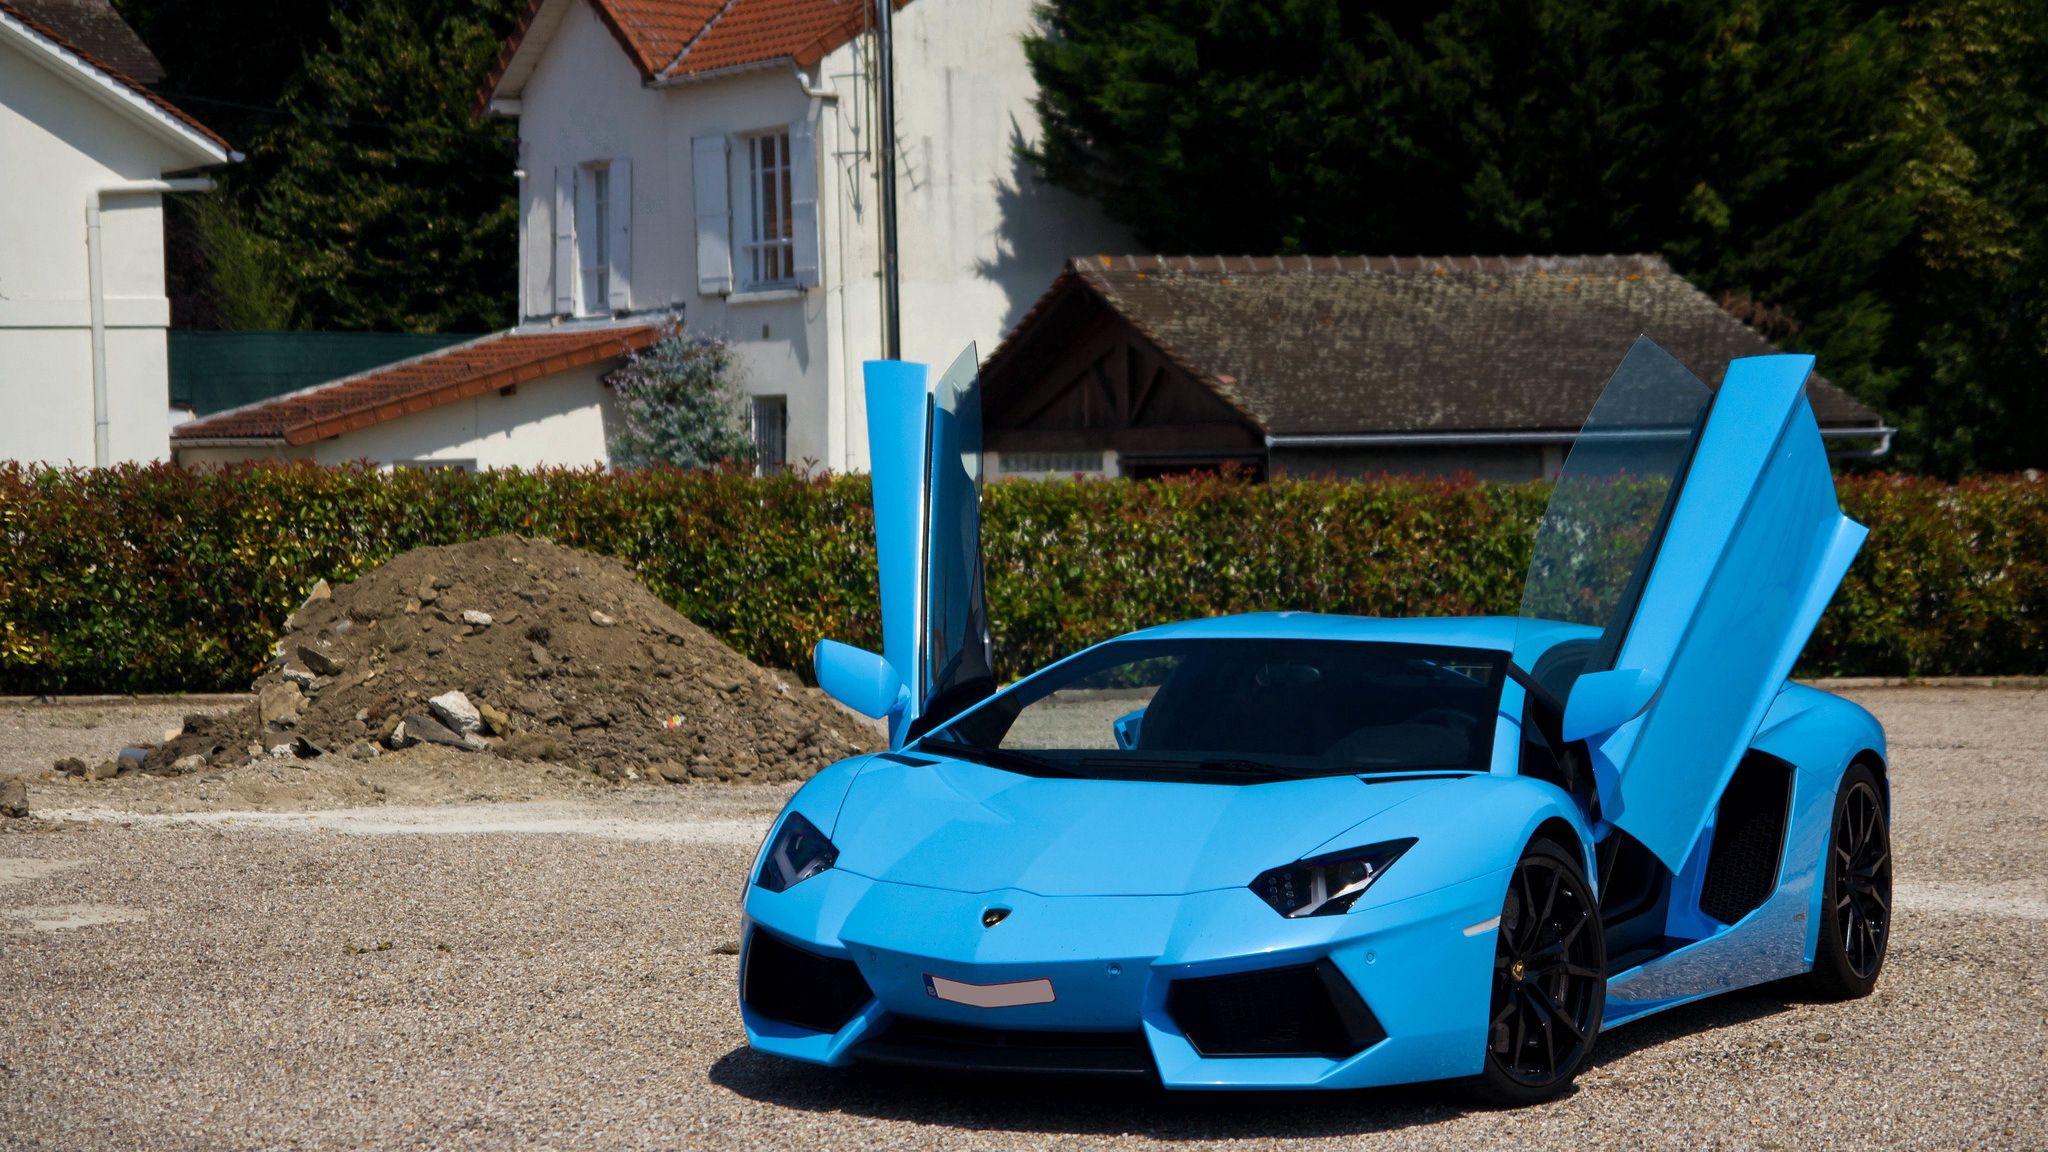 144039 download wallpaper Lamborghini, Cars, Aventador, Lp700-4 screensavers and pictures for free